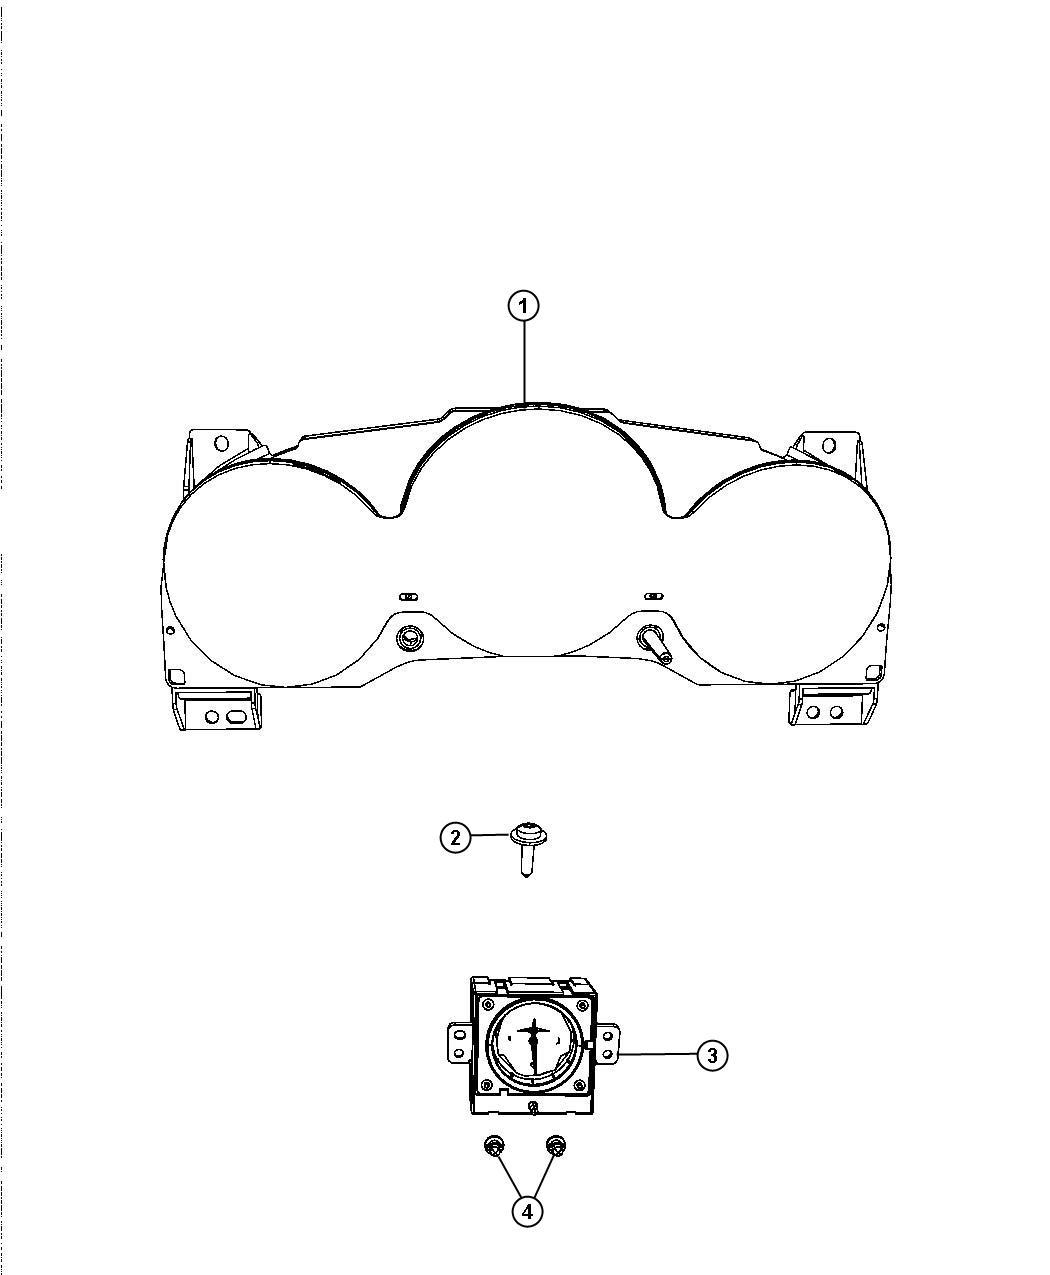 Chrysler Sebring Cluster. Instrument panel. [140 mph